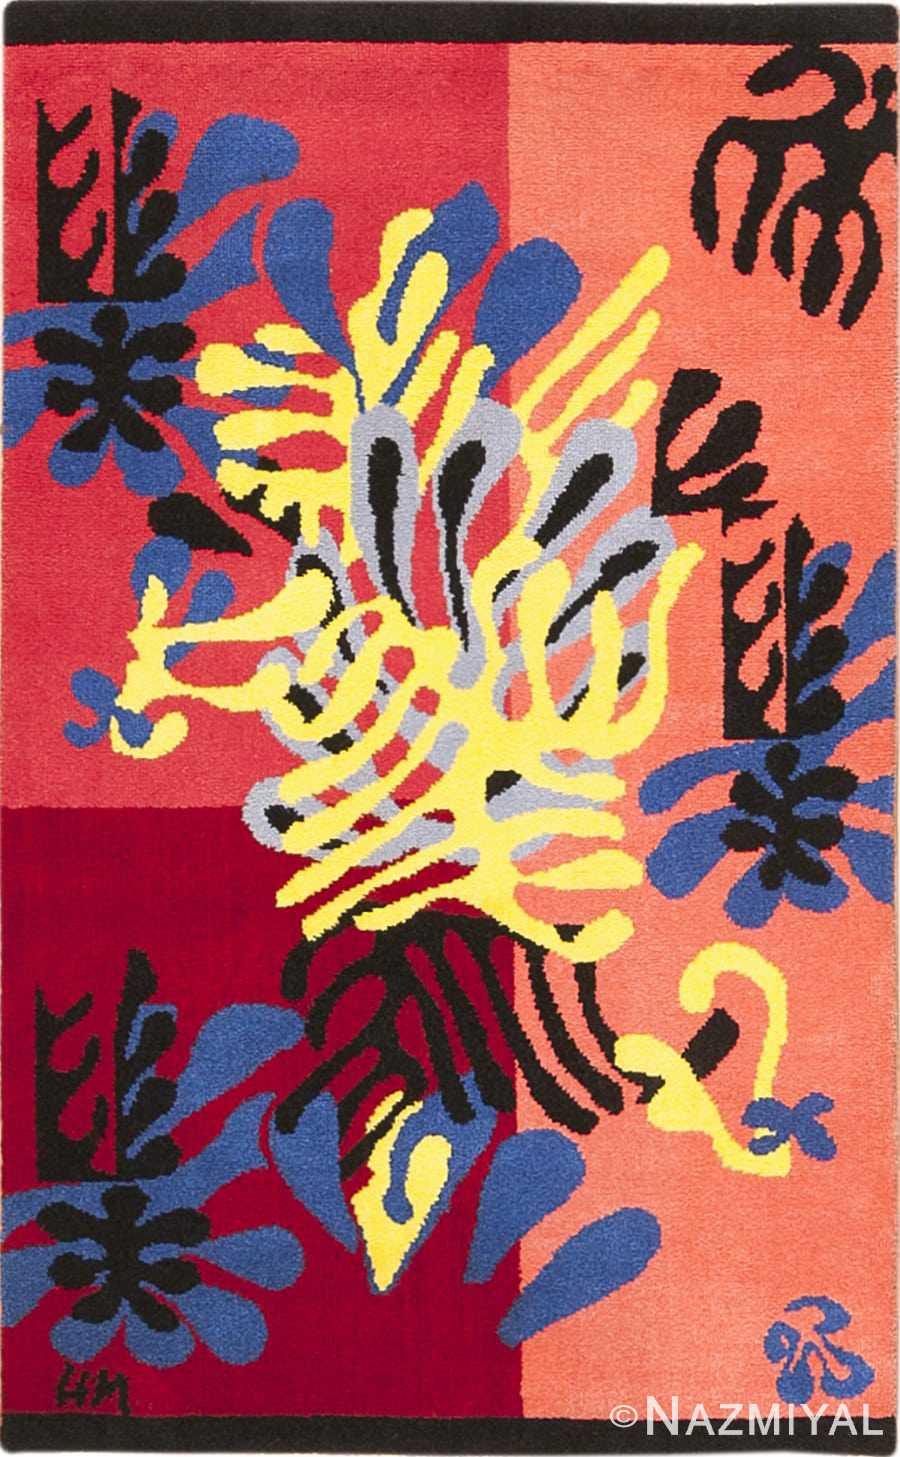 Henri Matisse Cut Outs Henri Matisse Moma Exhibit Of Cut